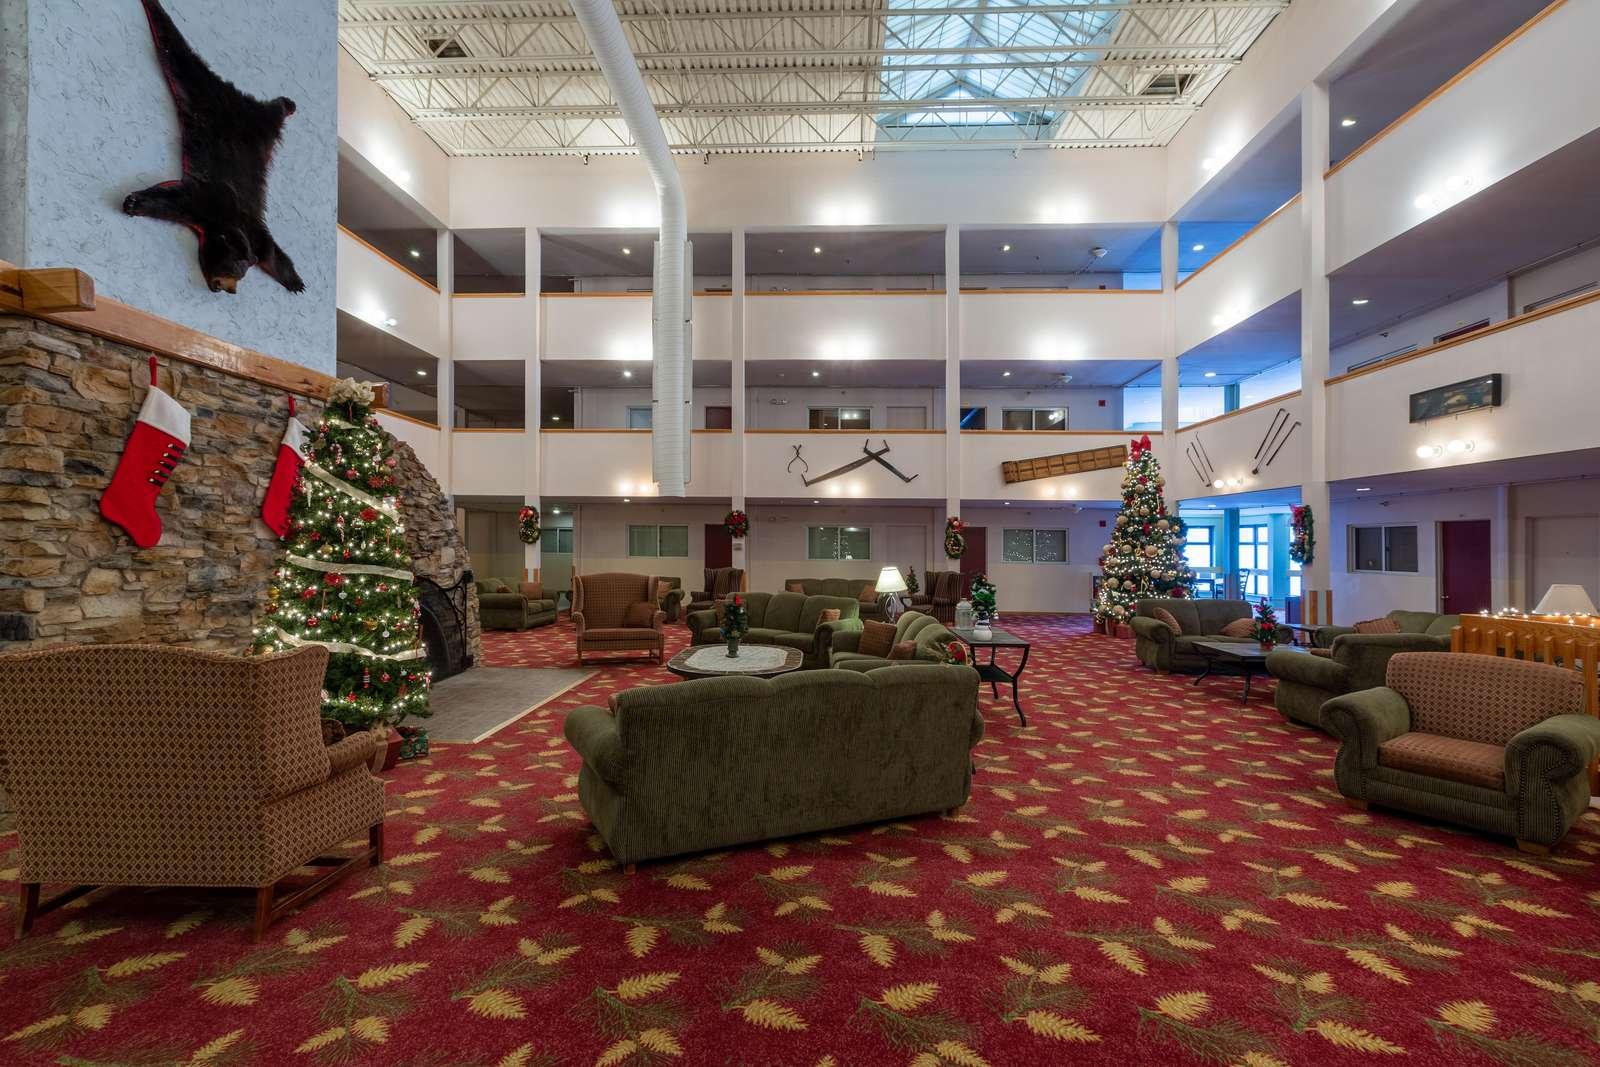 Mountain Lodge Main Lobby Area